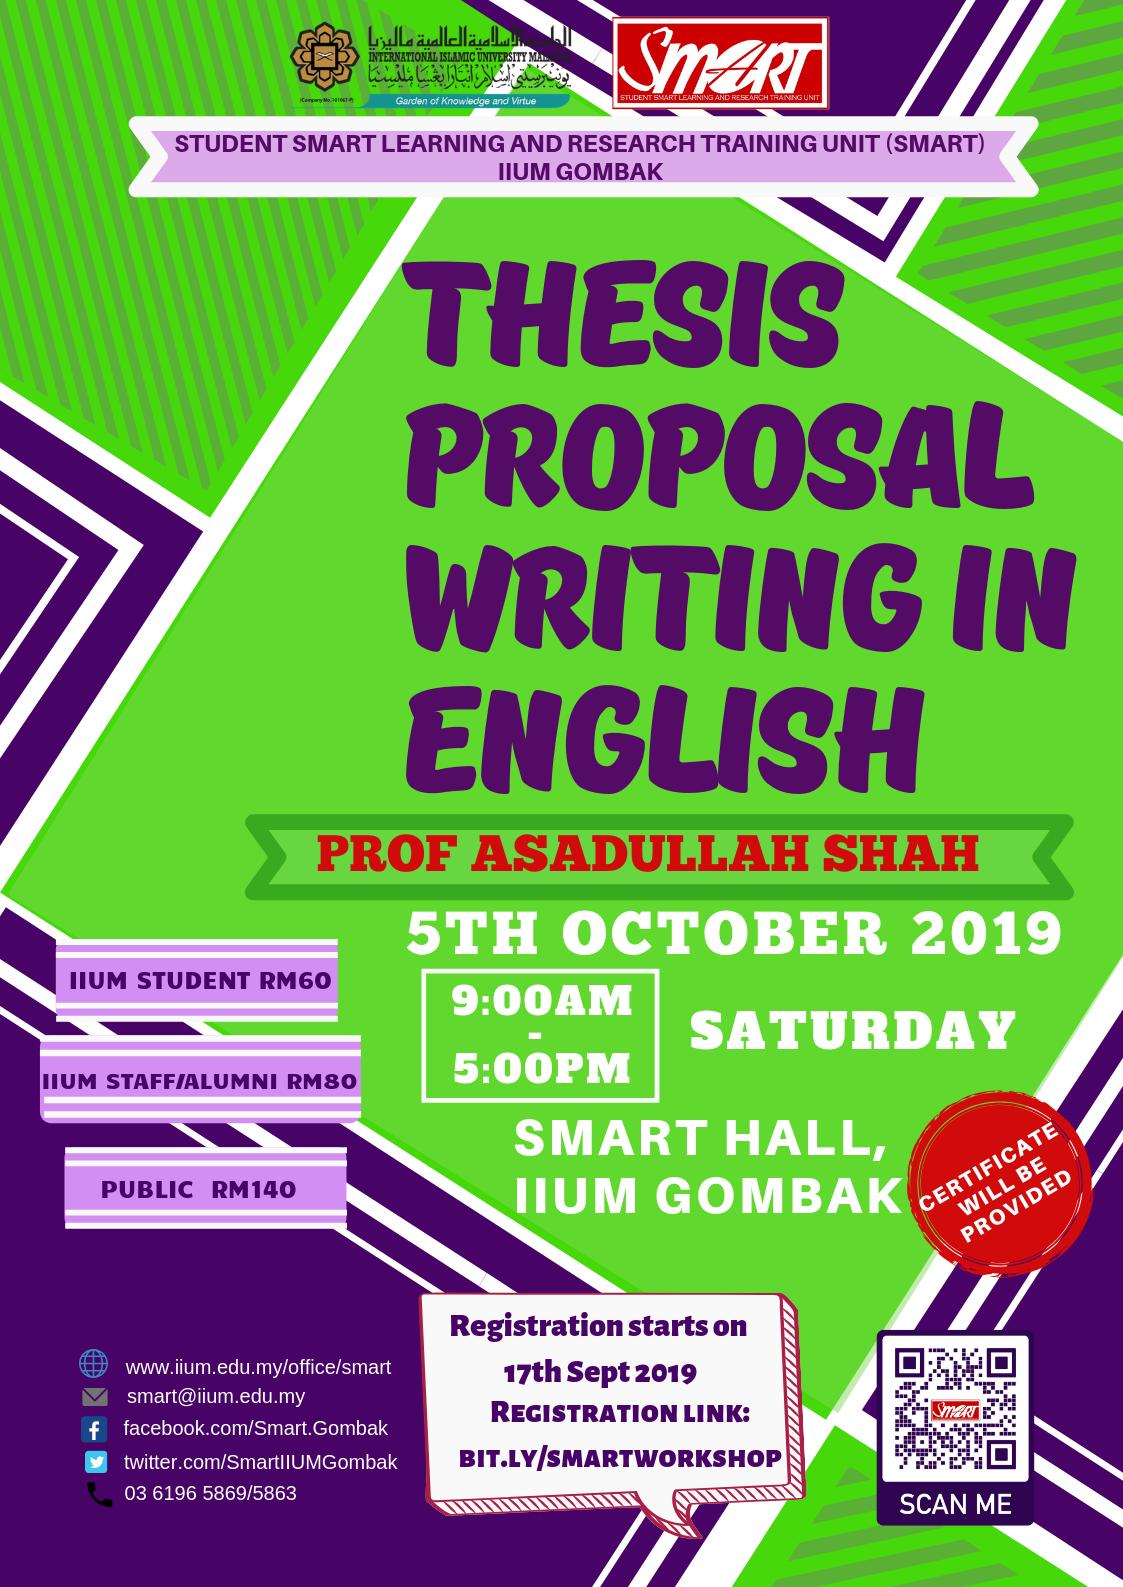 SEM 1, 19/20 - WORKSHOP - THESIS PROPOSAL WRITING IN ENGLISH